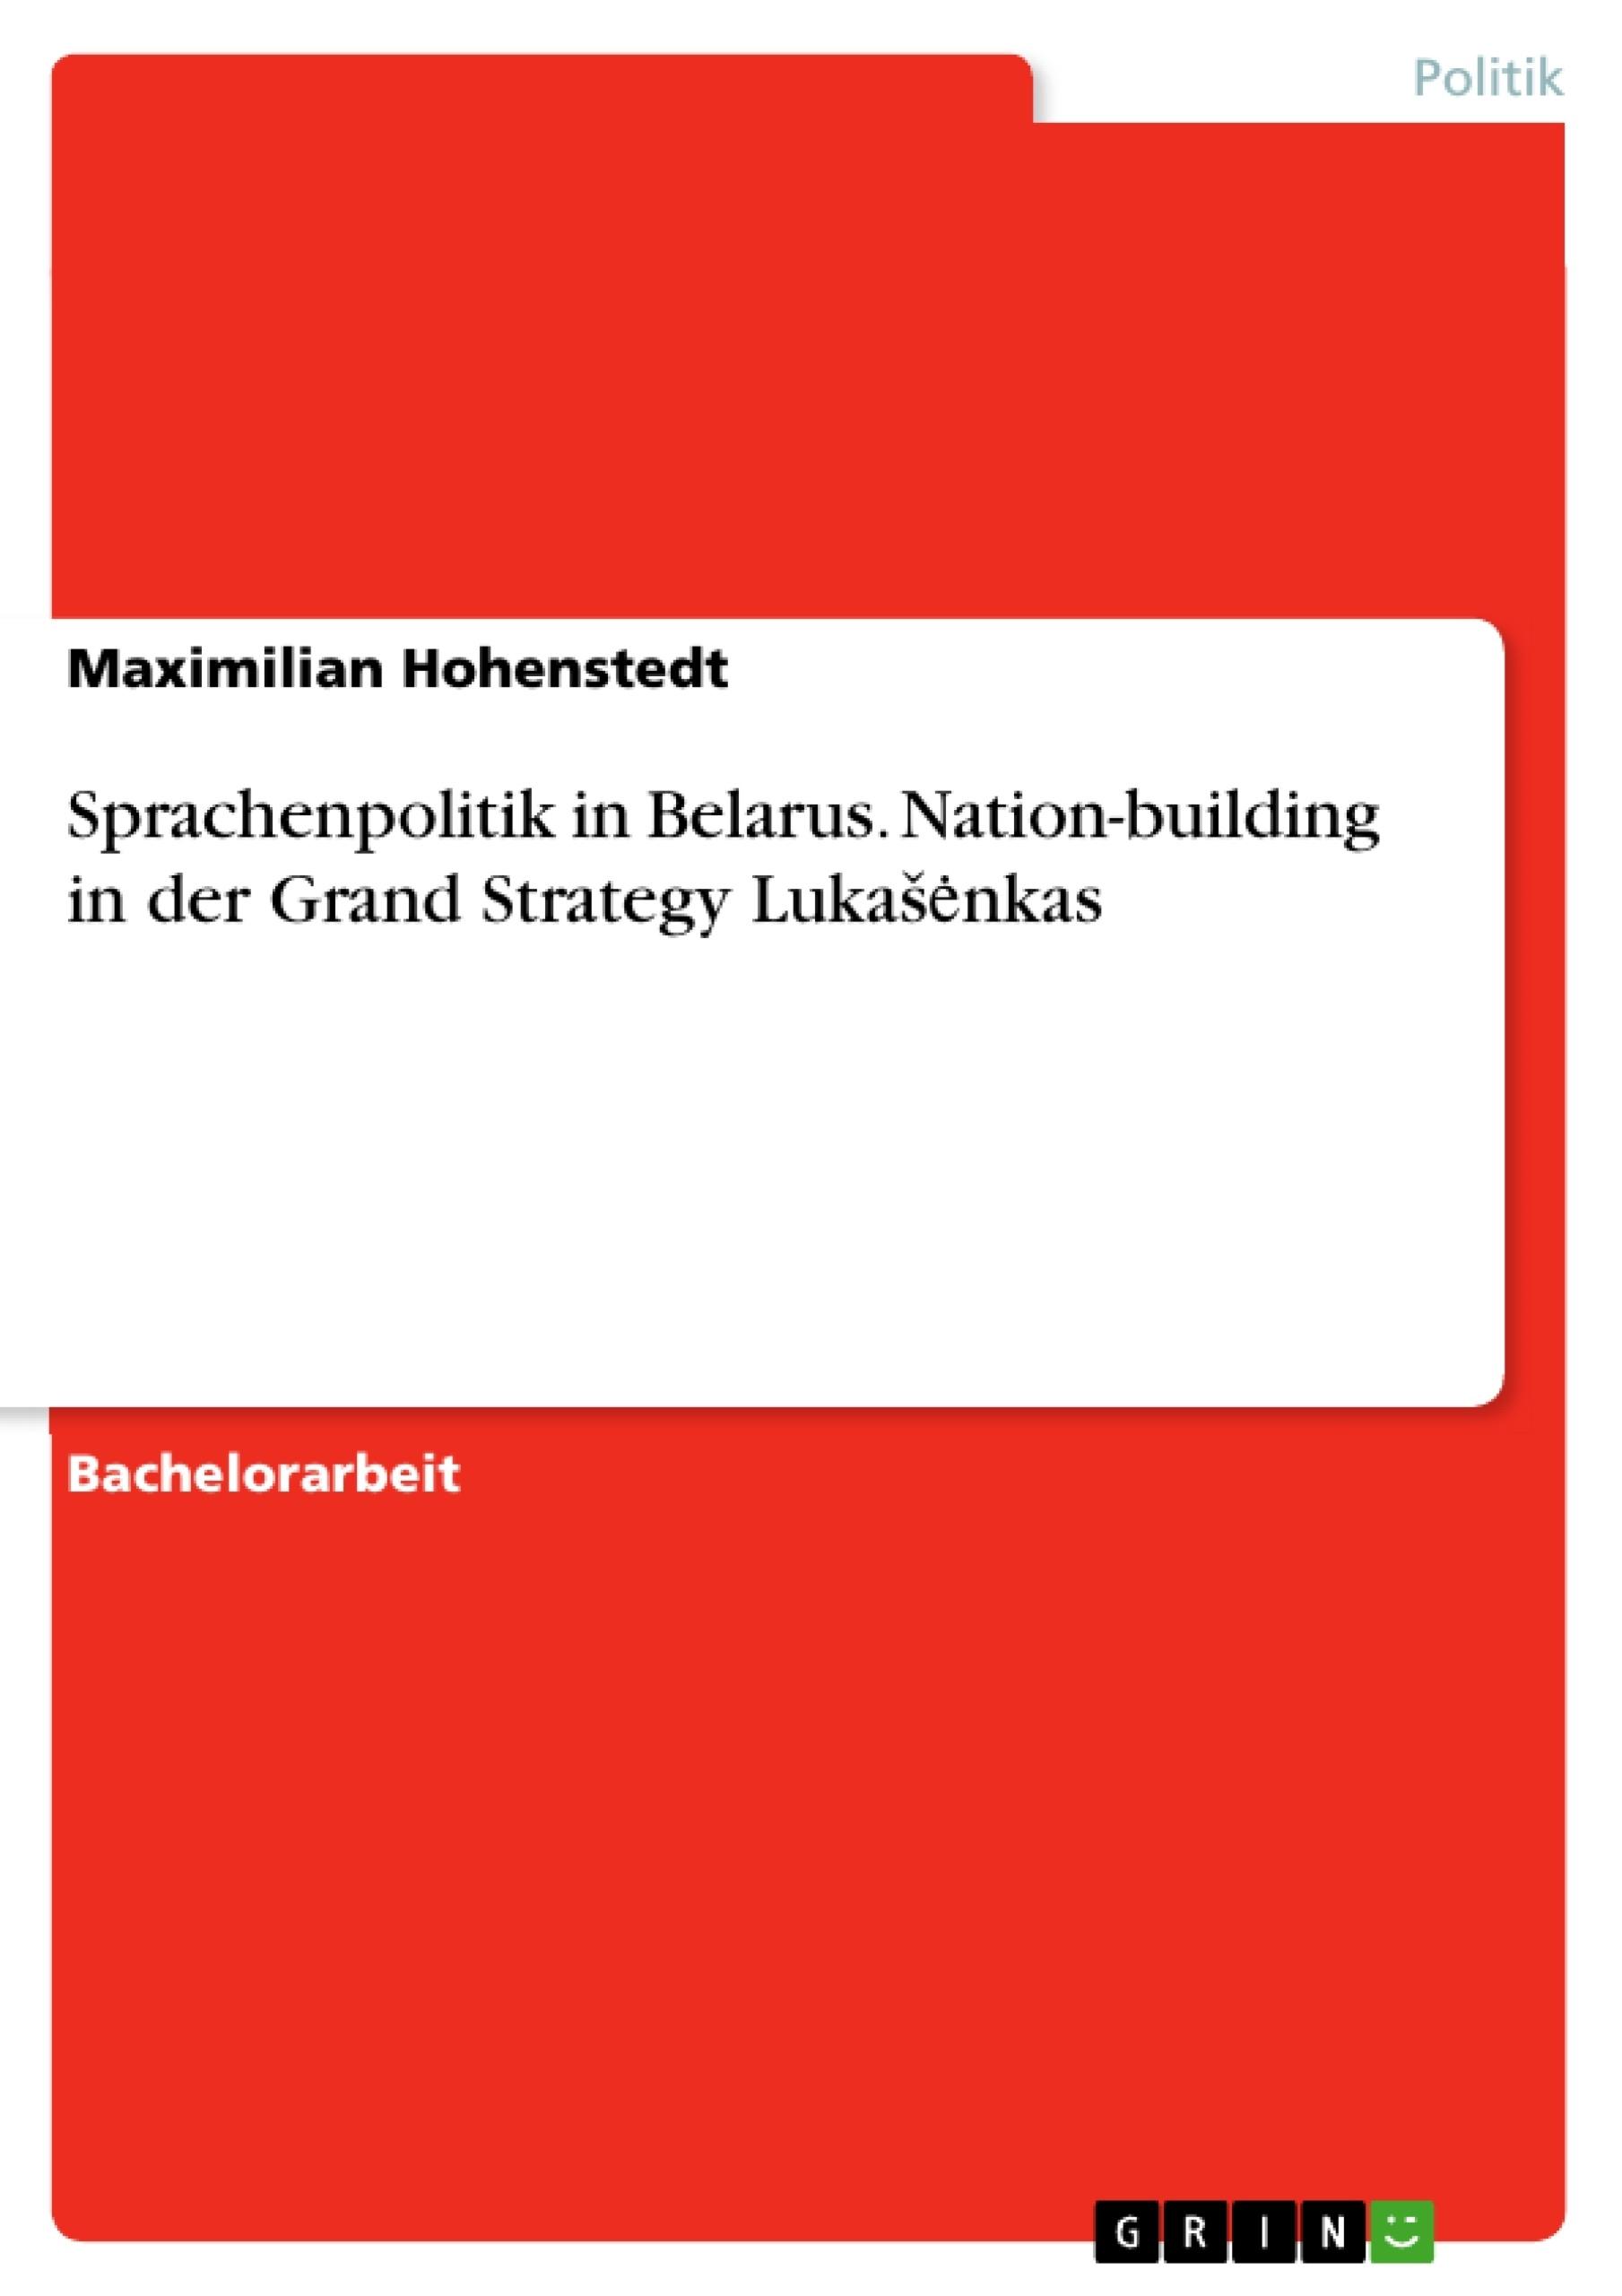 Titel: Sprachenpolitik in Belarus. Nation-building in der Grand Strategy Lukašėnkas